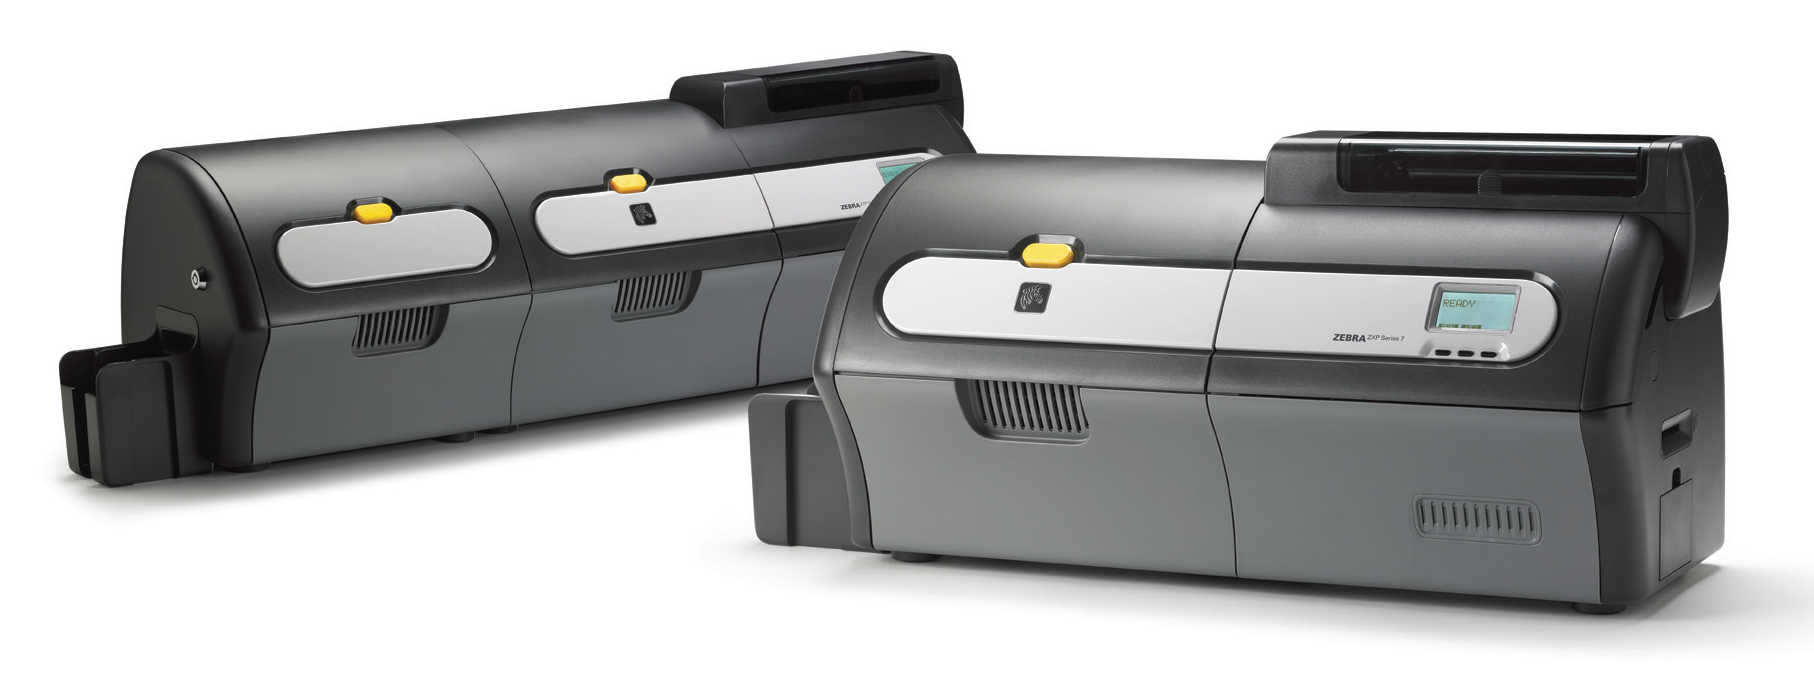 Two printer.jpg